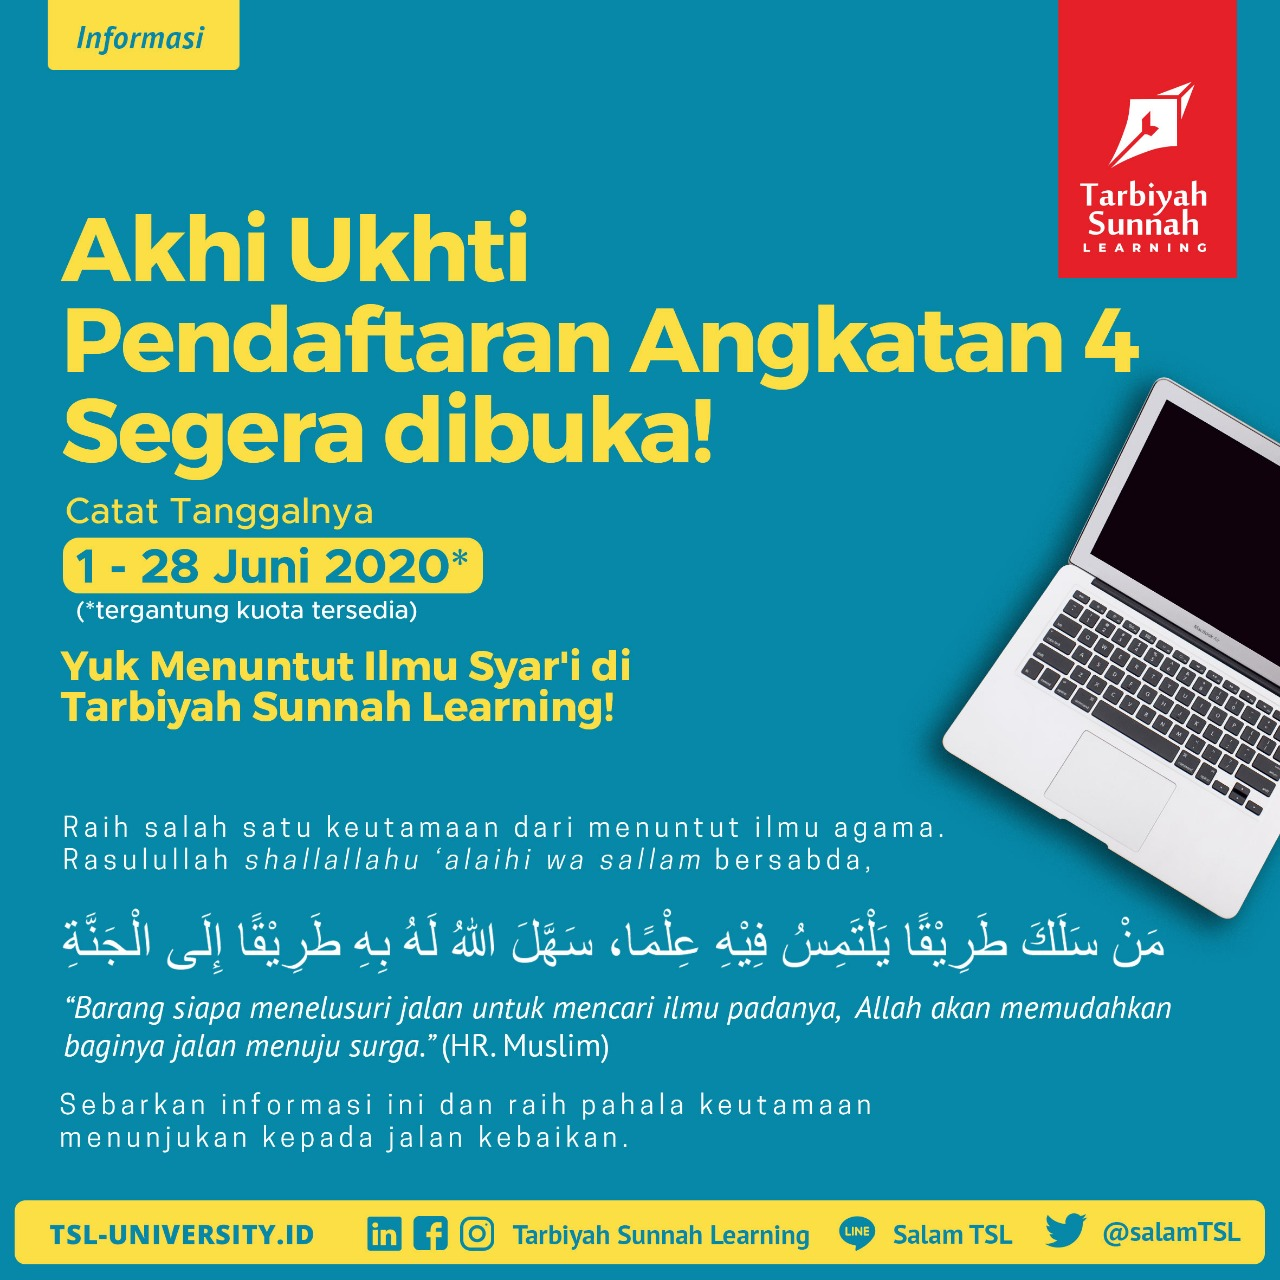 Yuk menuntut ilmu syar'i di Tarbiyah Sunnah Learning.